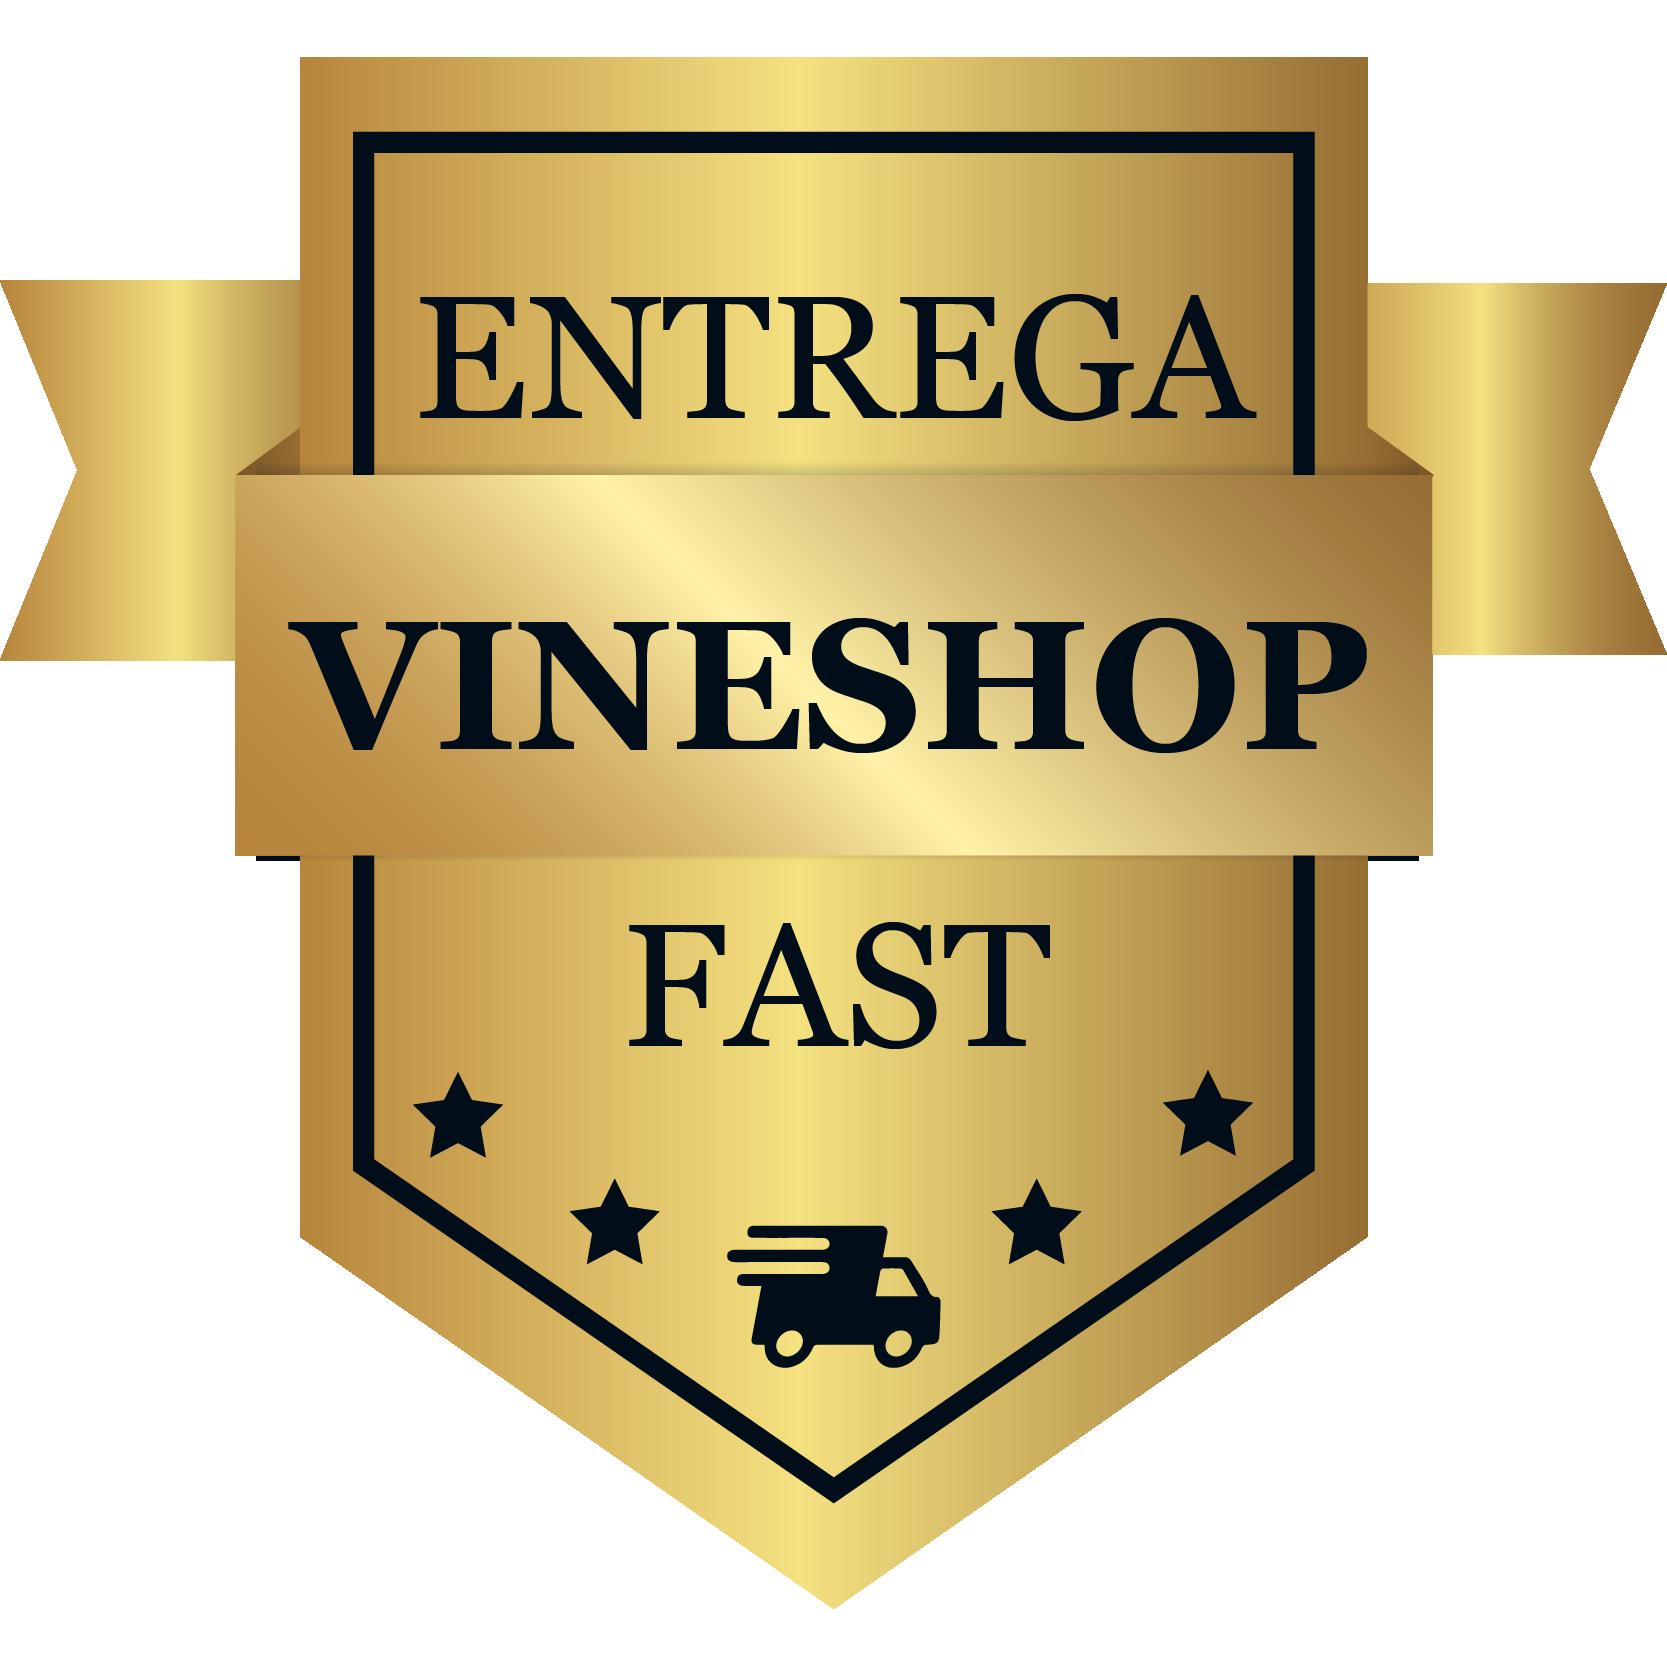 Entrega Vineshop Fast